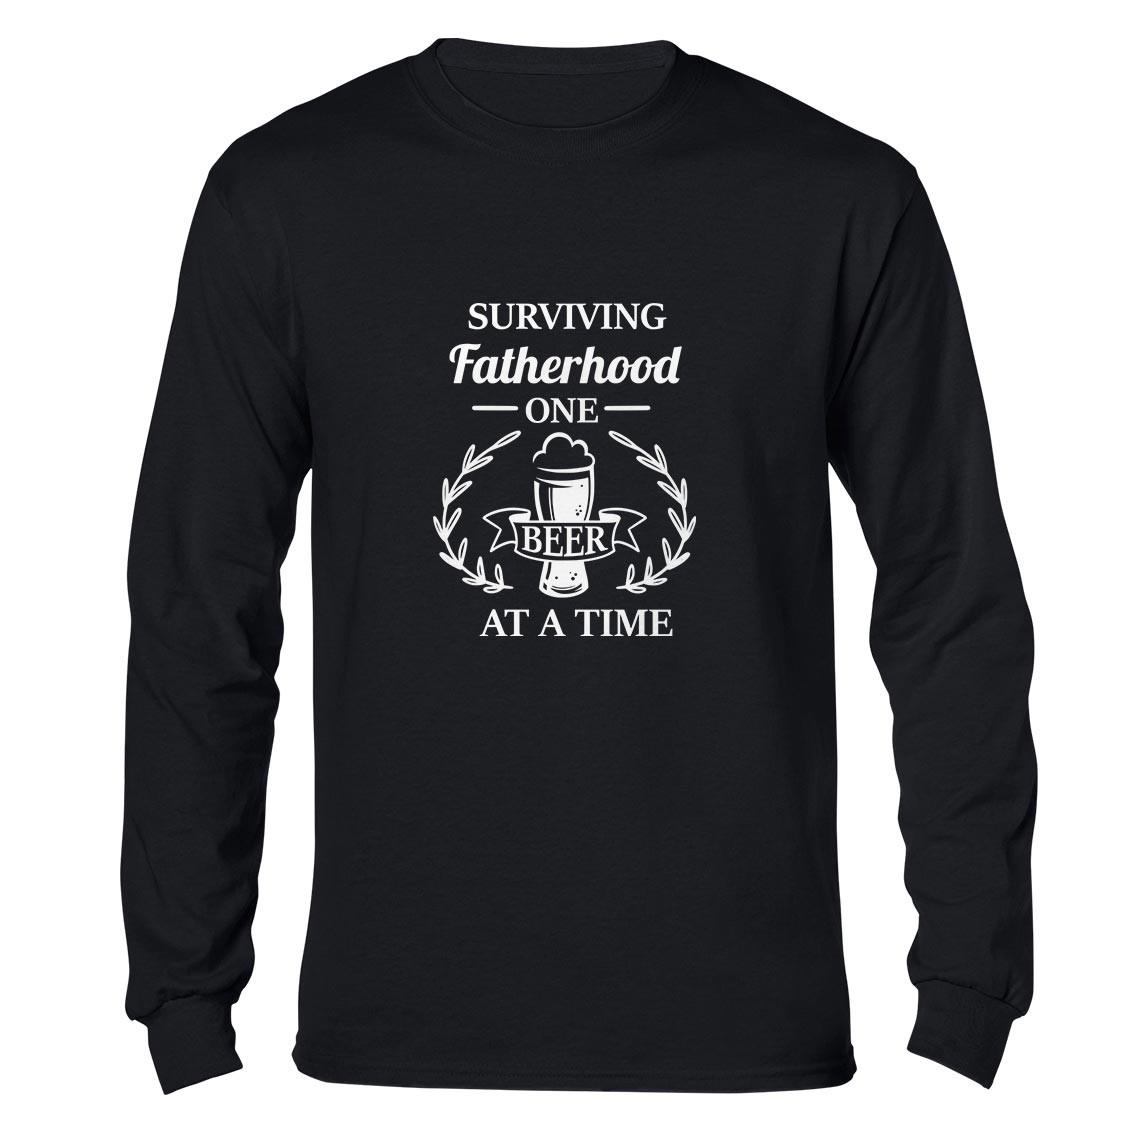 Adult Long Sleeve T-Shirts